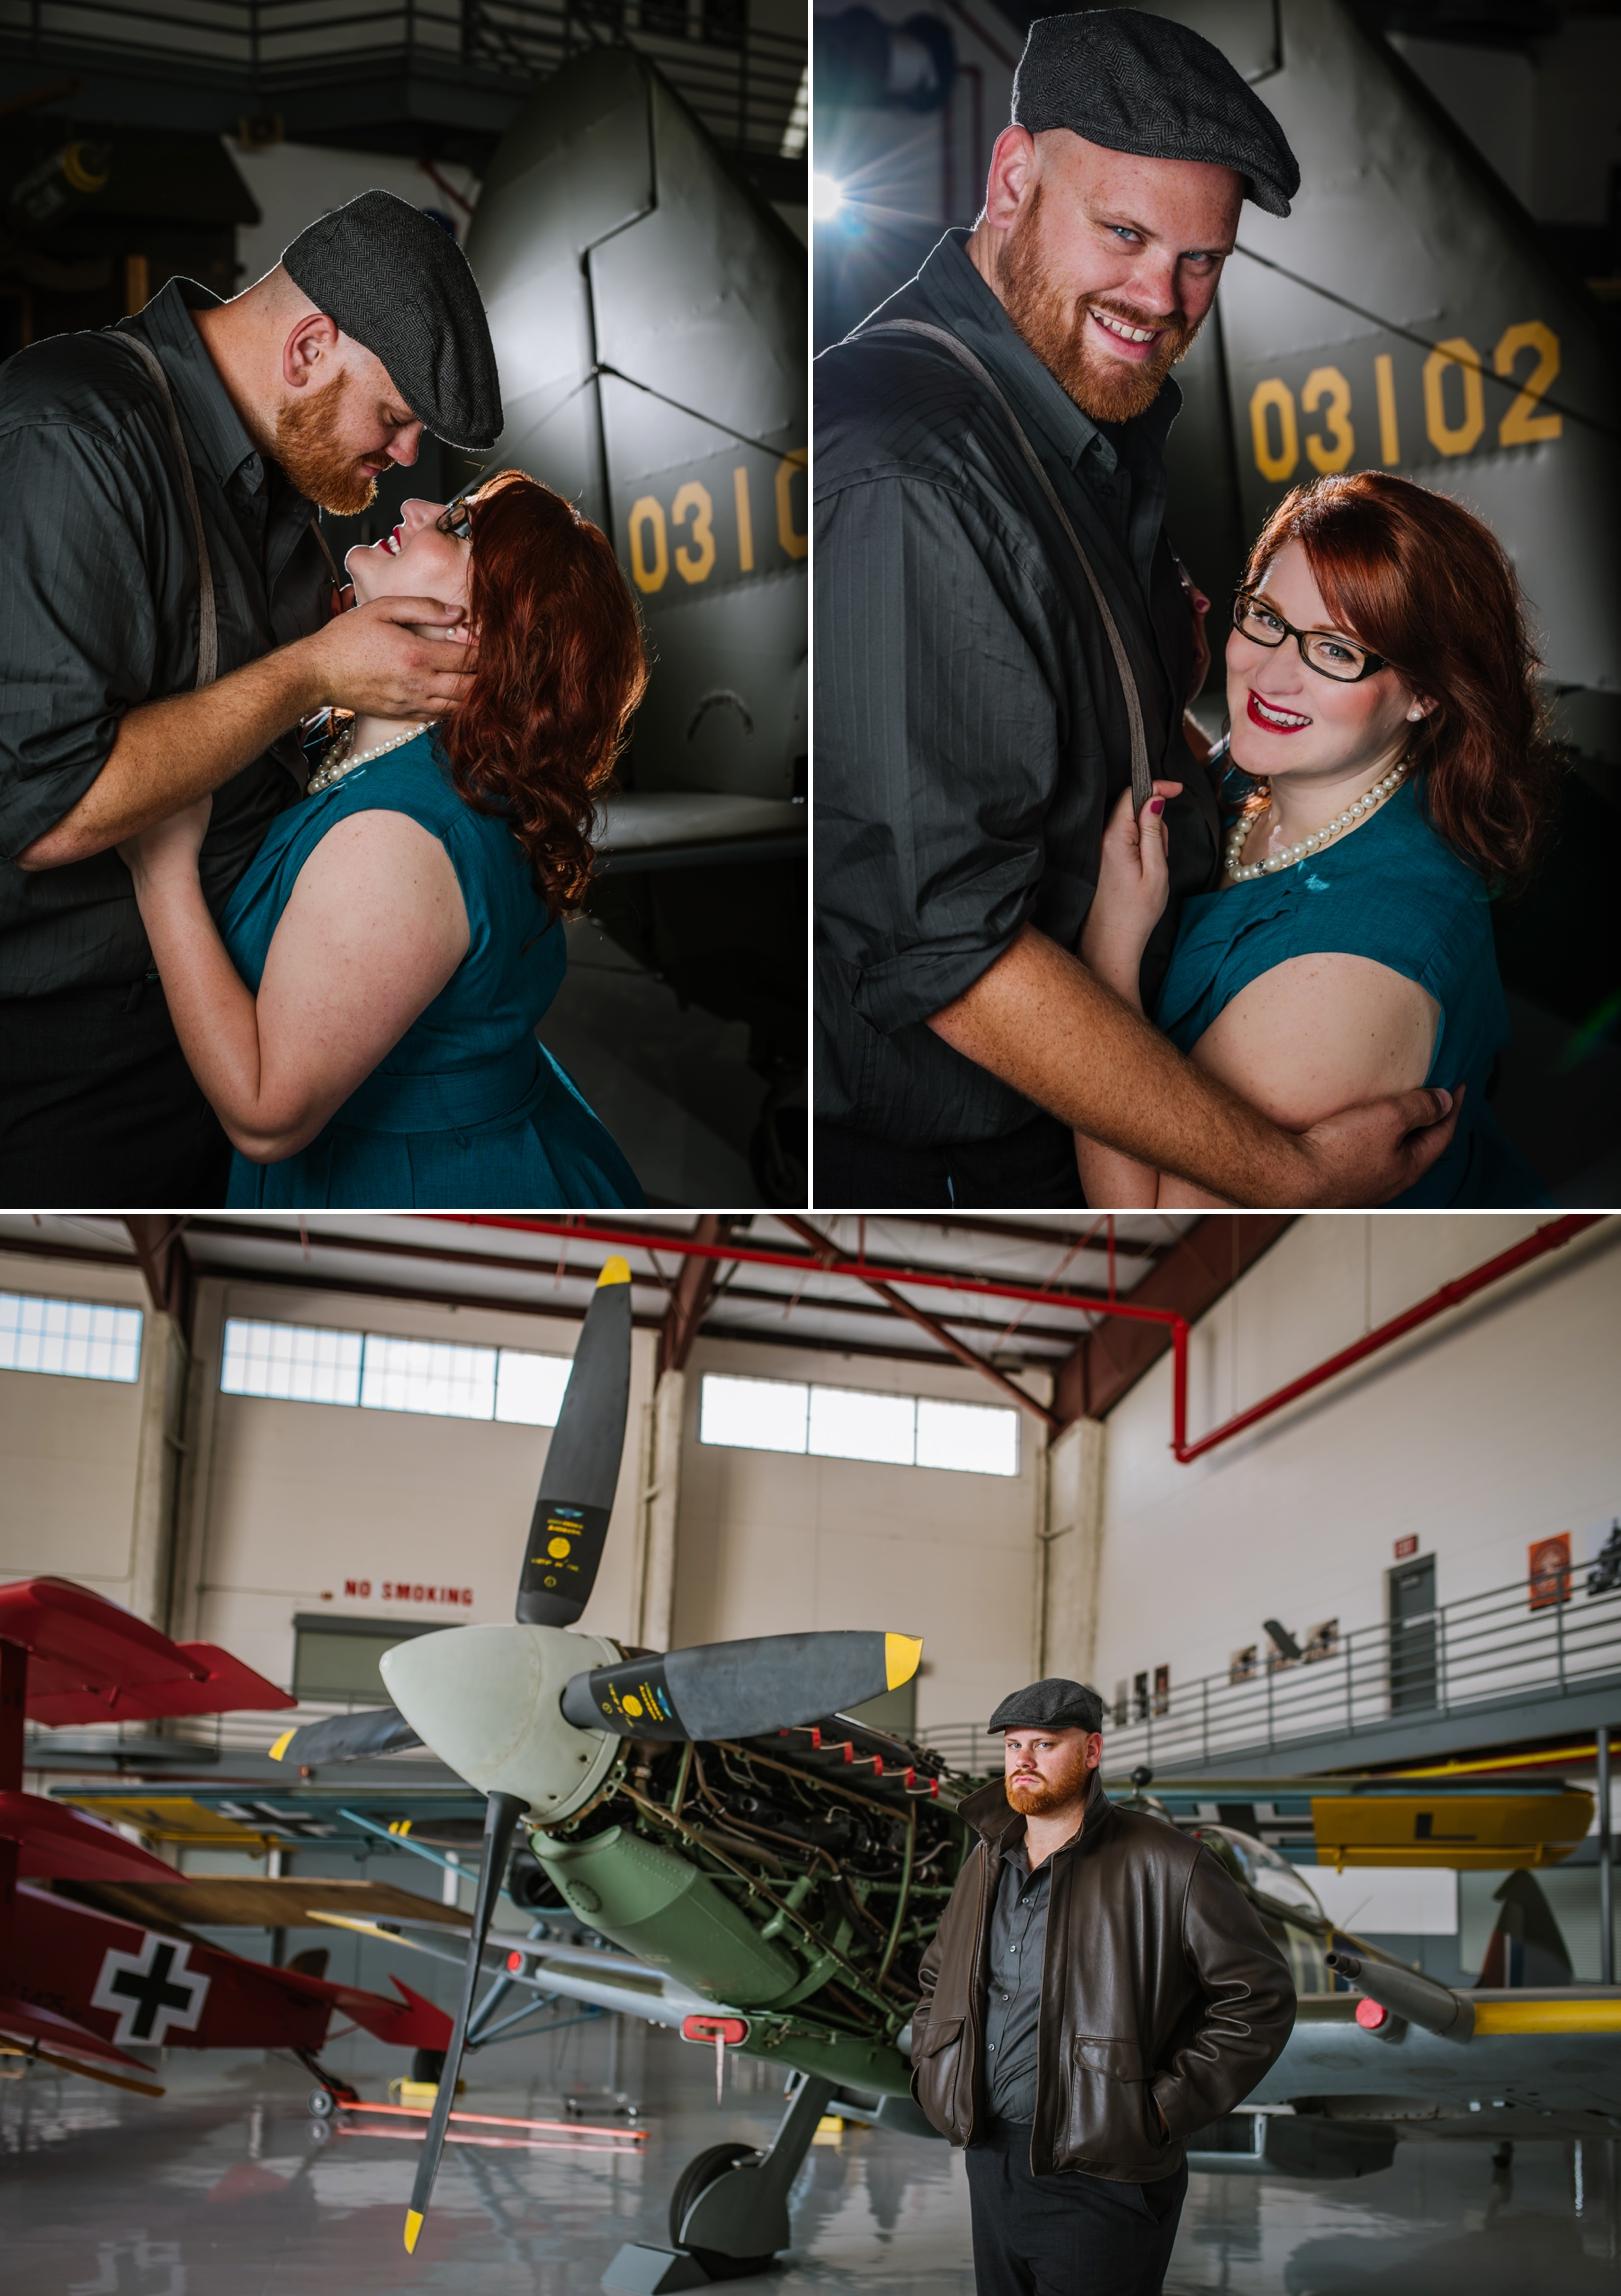 fantasy-of-flight-aviation-themed-engagement-photos-lakeland-florida_0003.jpg